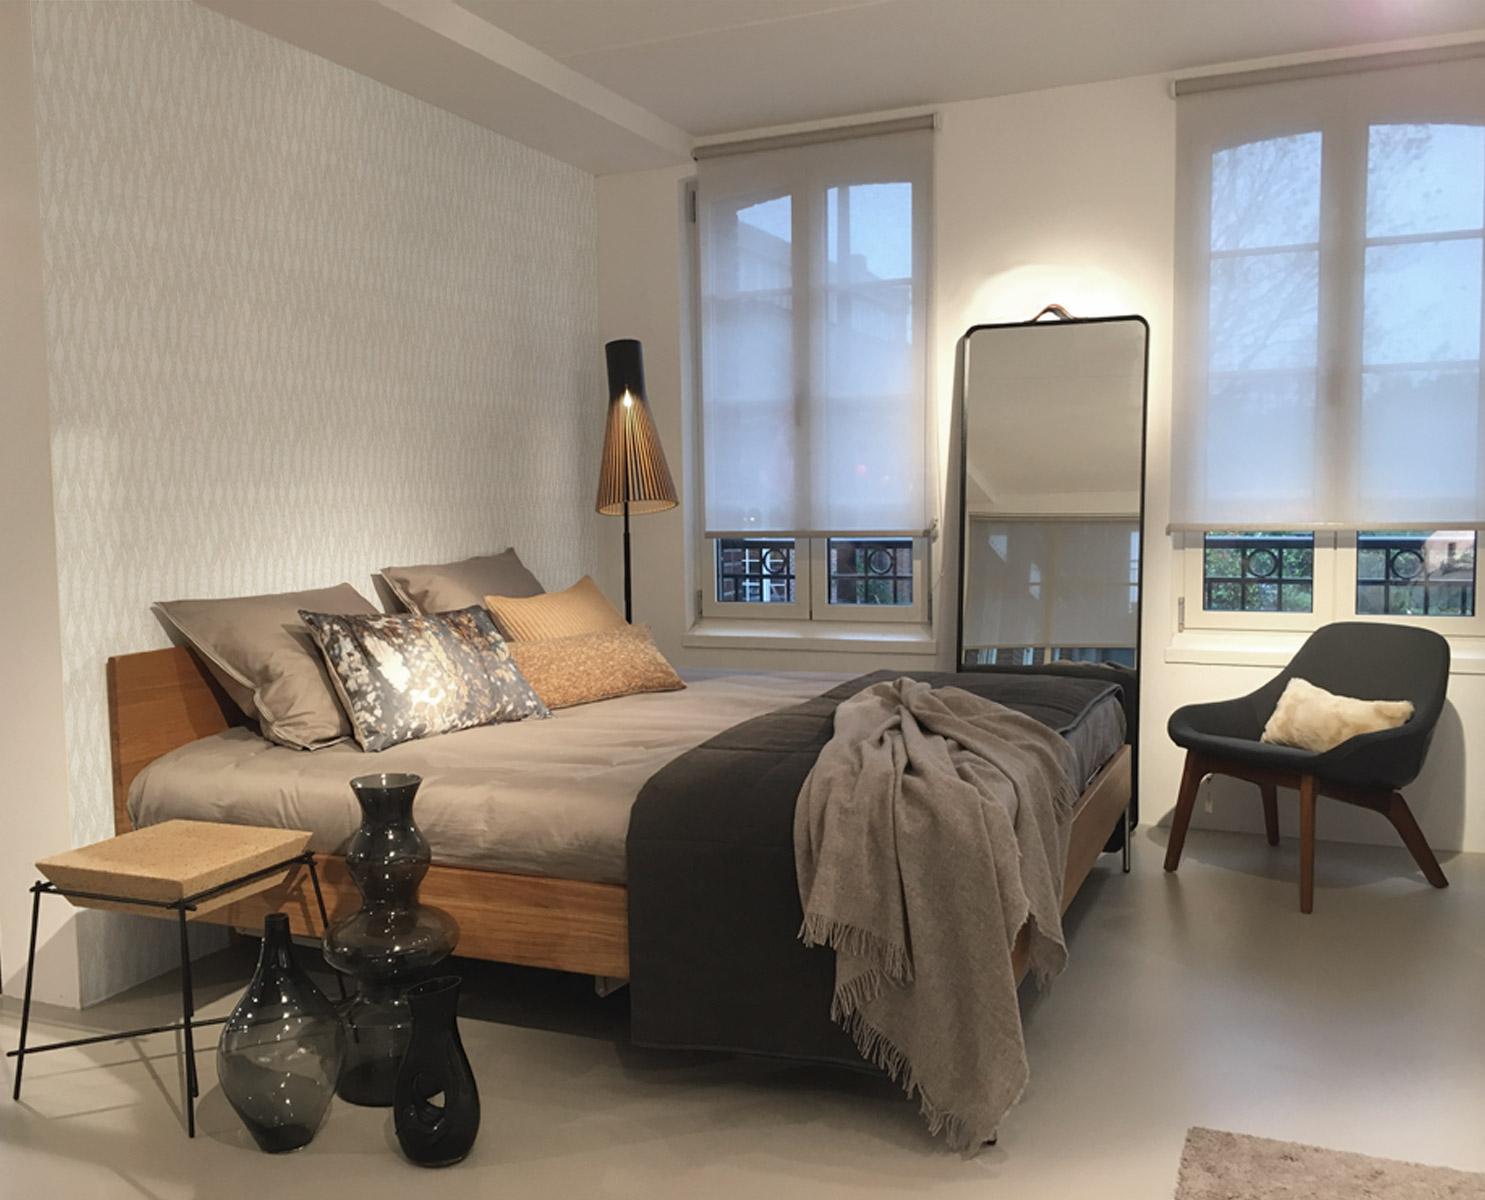 Make-over voor je slaapkamer! - SLAAPKAMER DESIGN